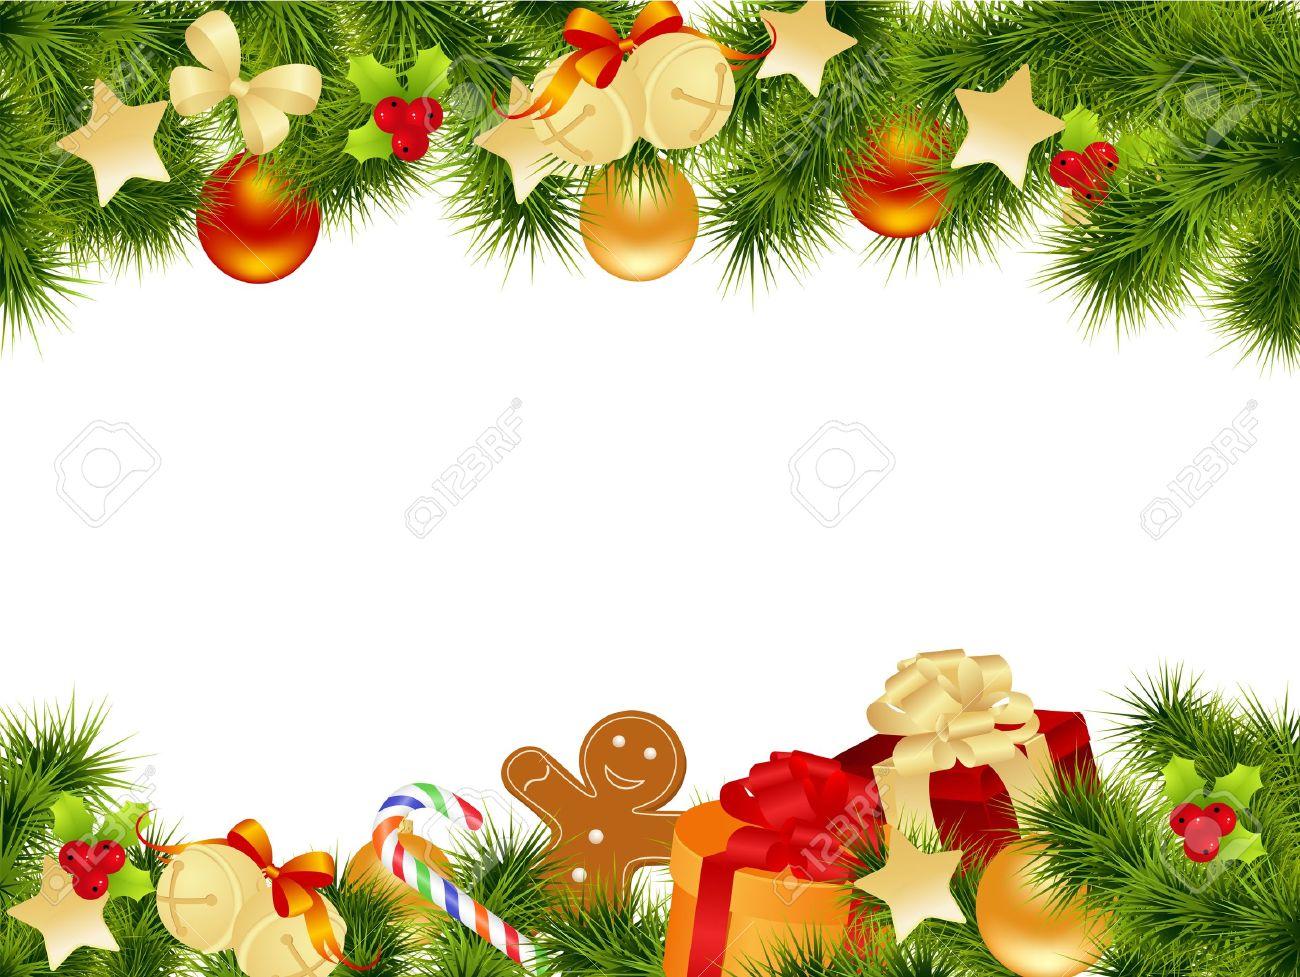 Christmas Card Frames Png